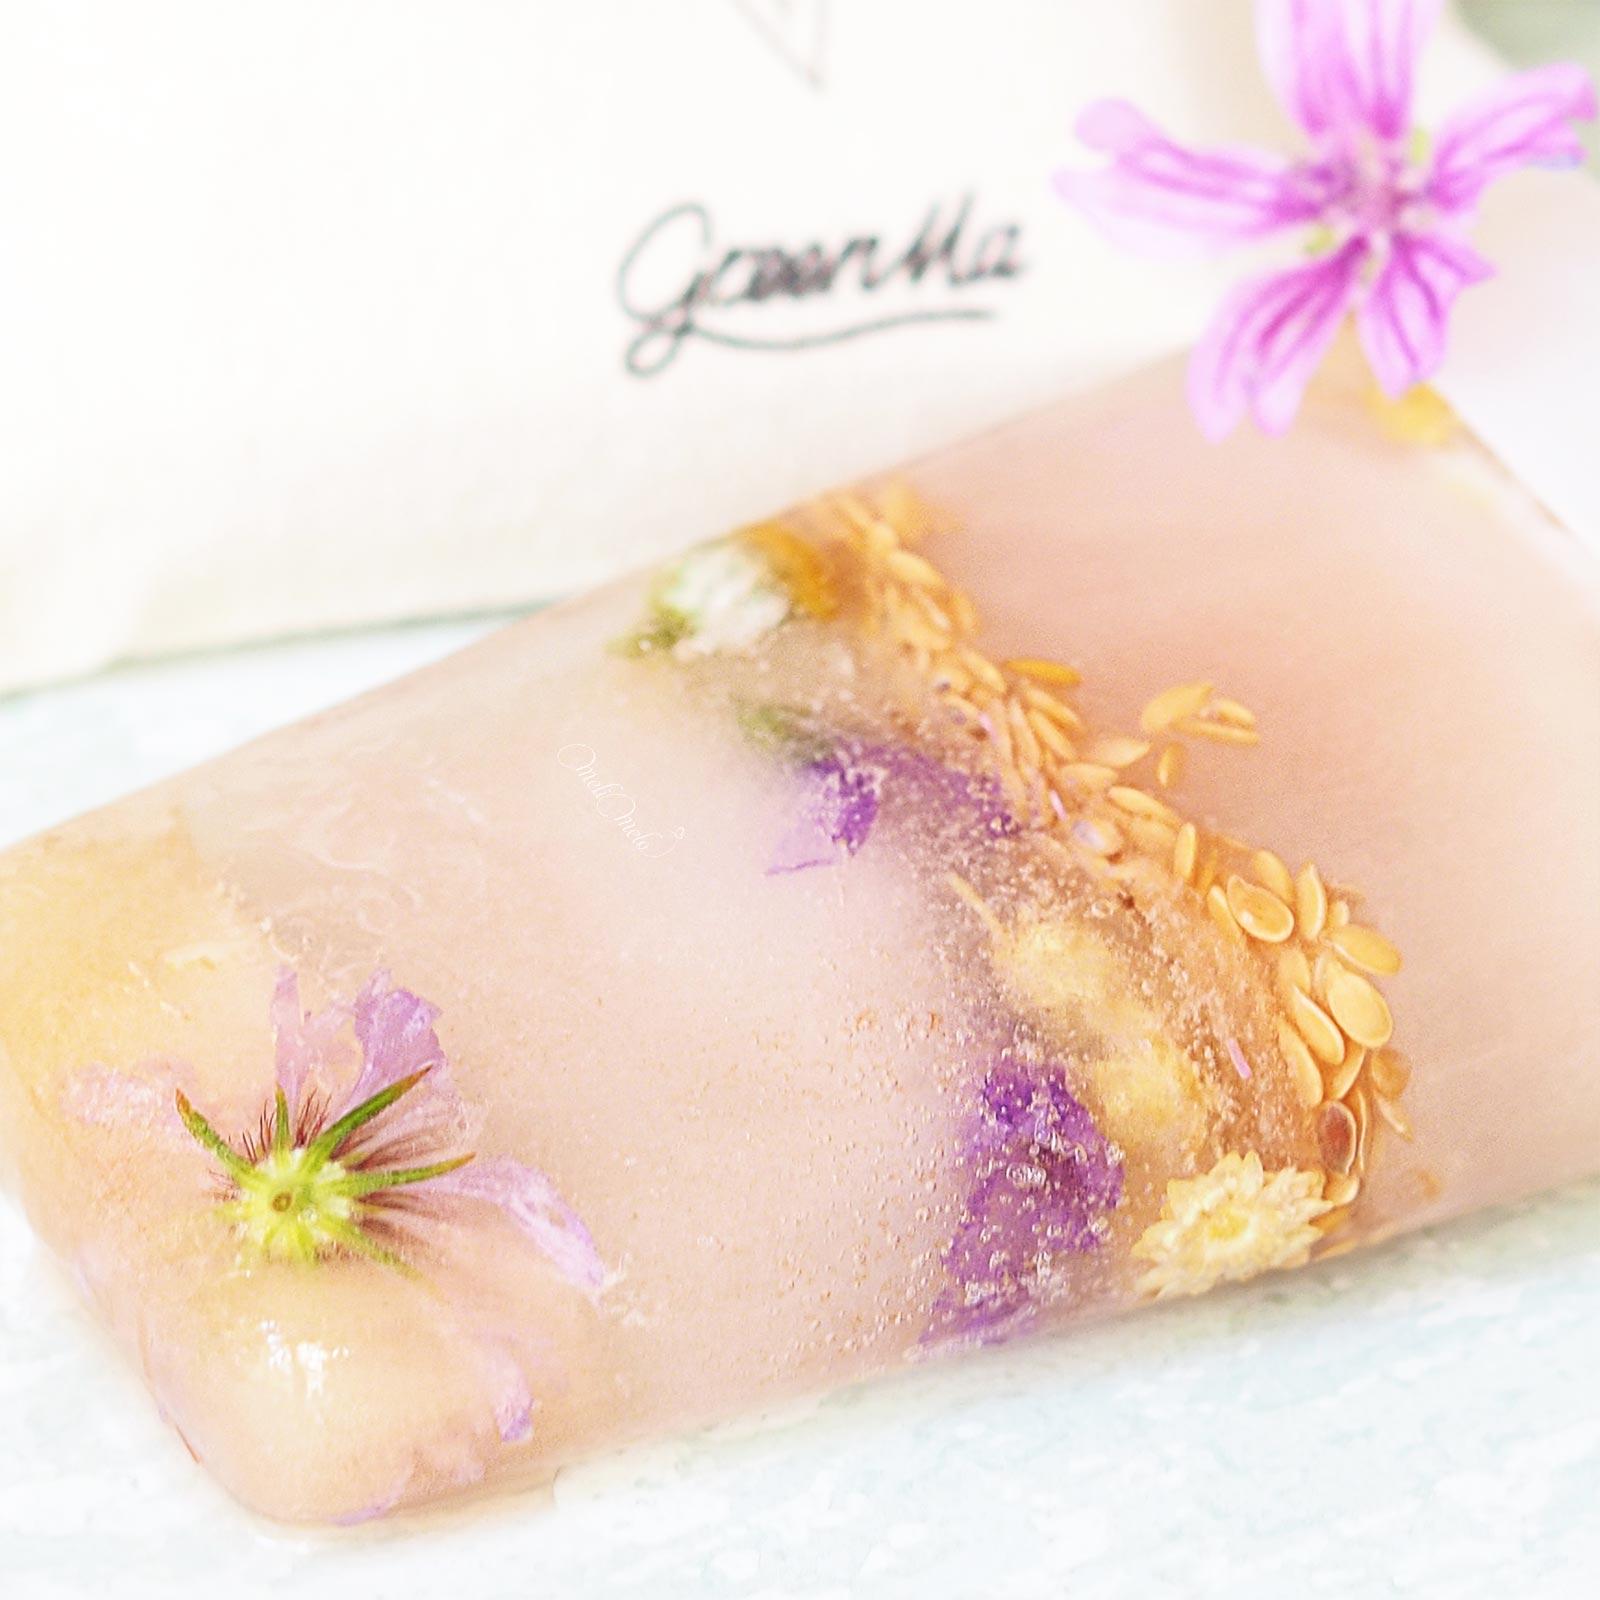 glace-fleur-mauve-immortelle-lin-the-vert-bio-canneberge-goji-laboutiquedemelimelo